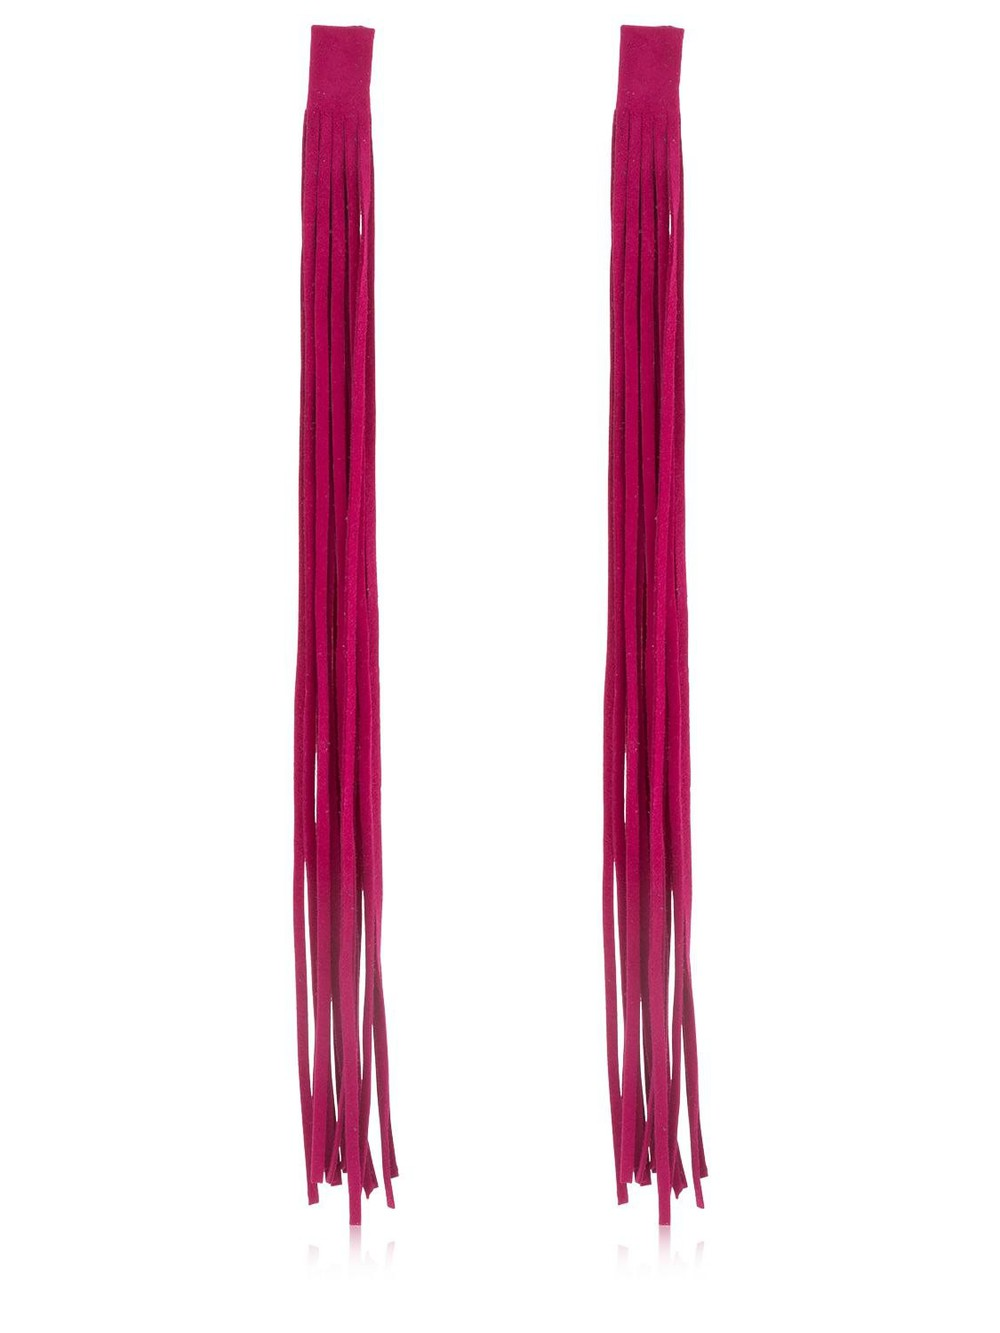 SASKIA DIEZ Leather Fringe Earrings in fuchsia